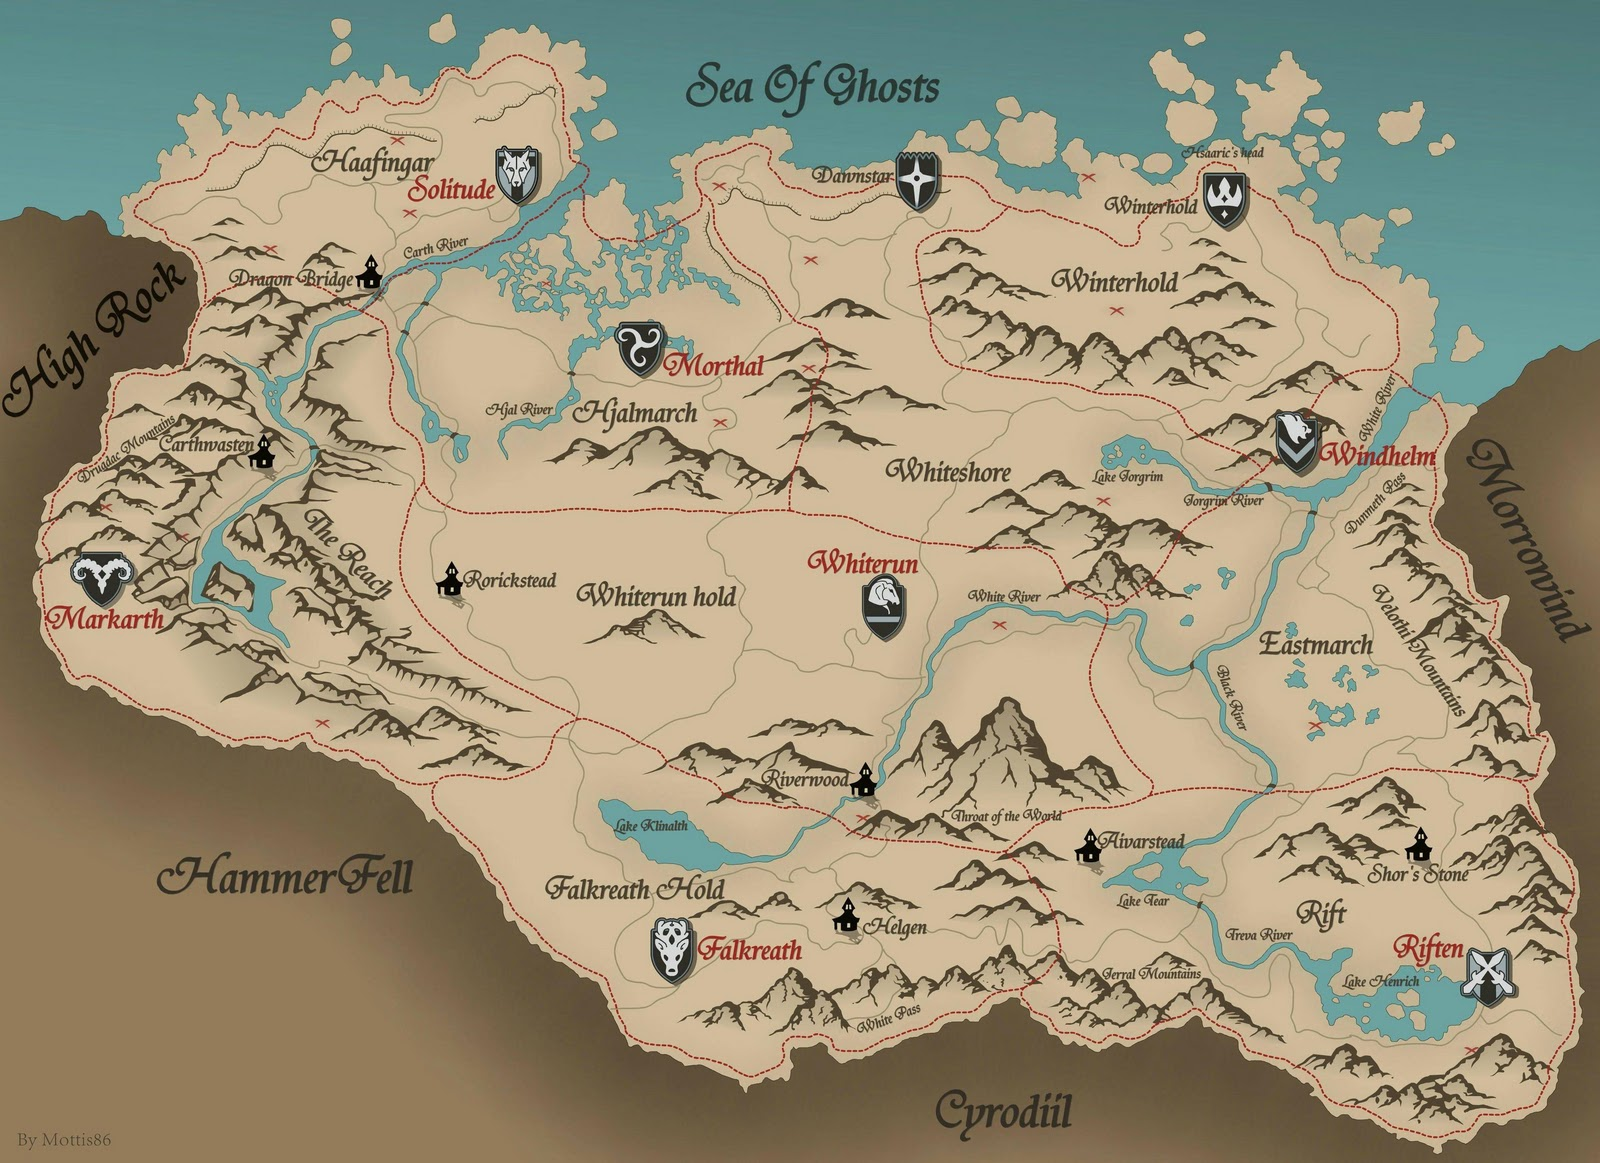 The Elder Scrolls V Skyrim HD map with treasure location